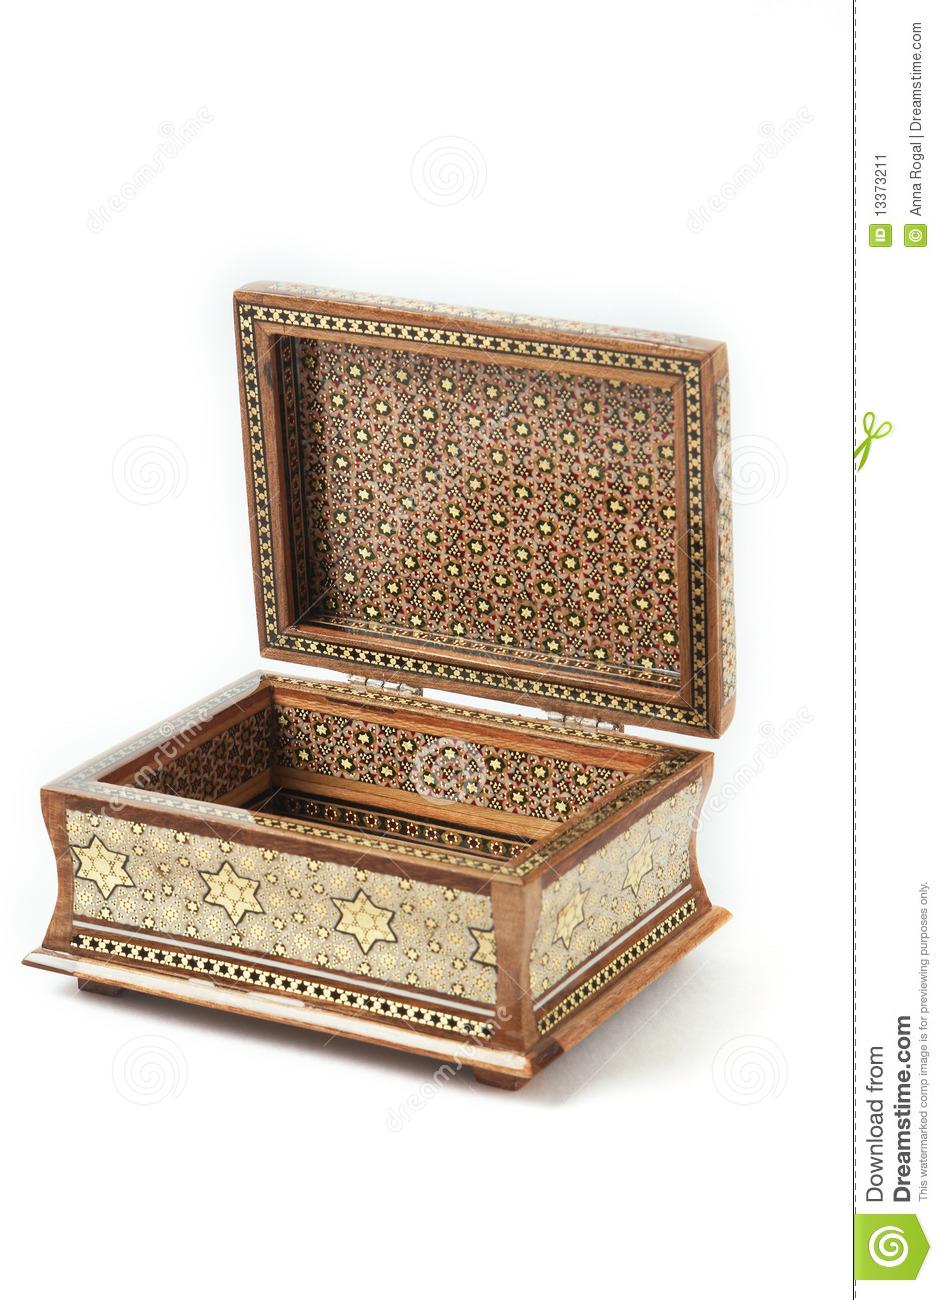 The opened khatam casked.